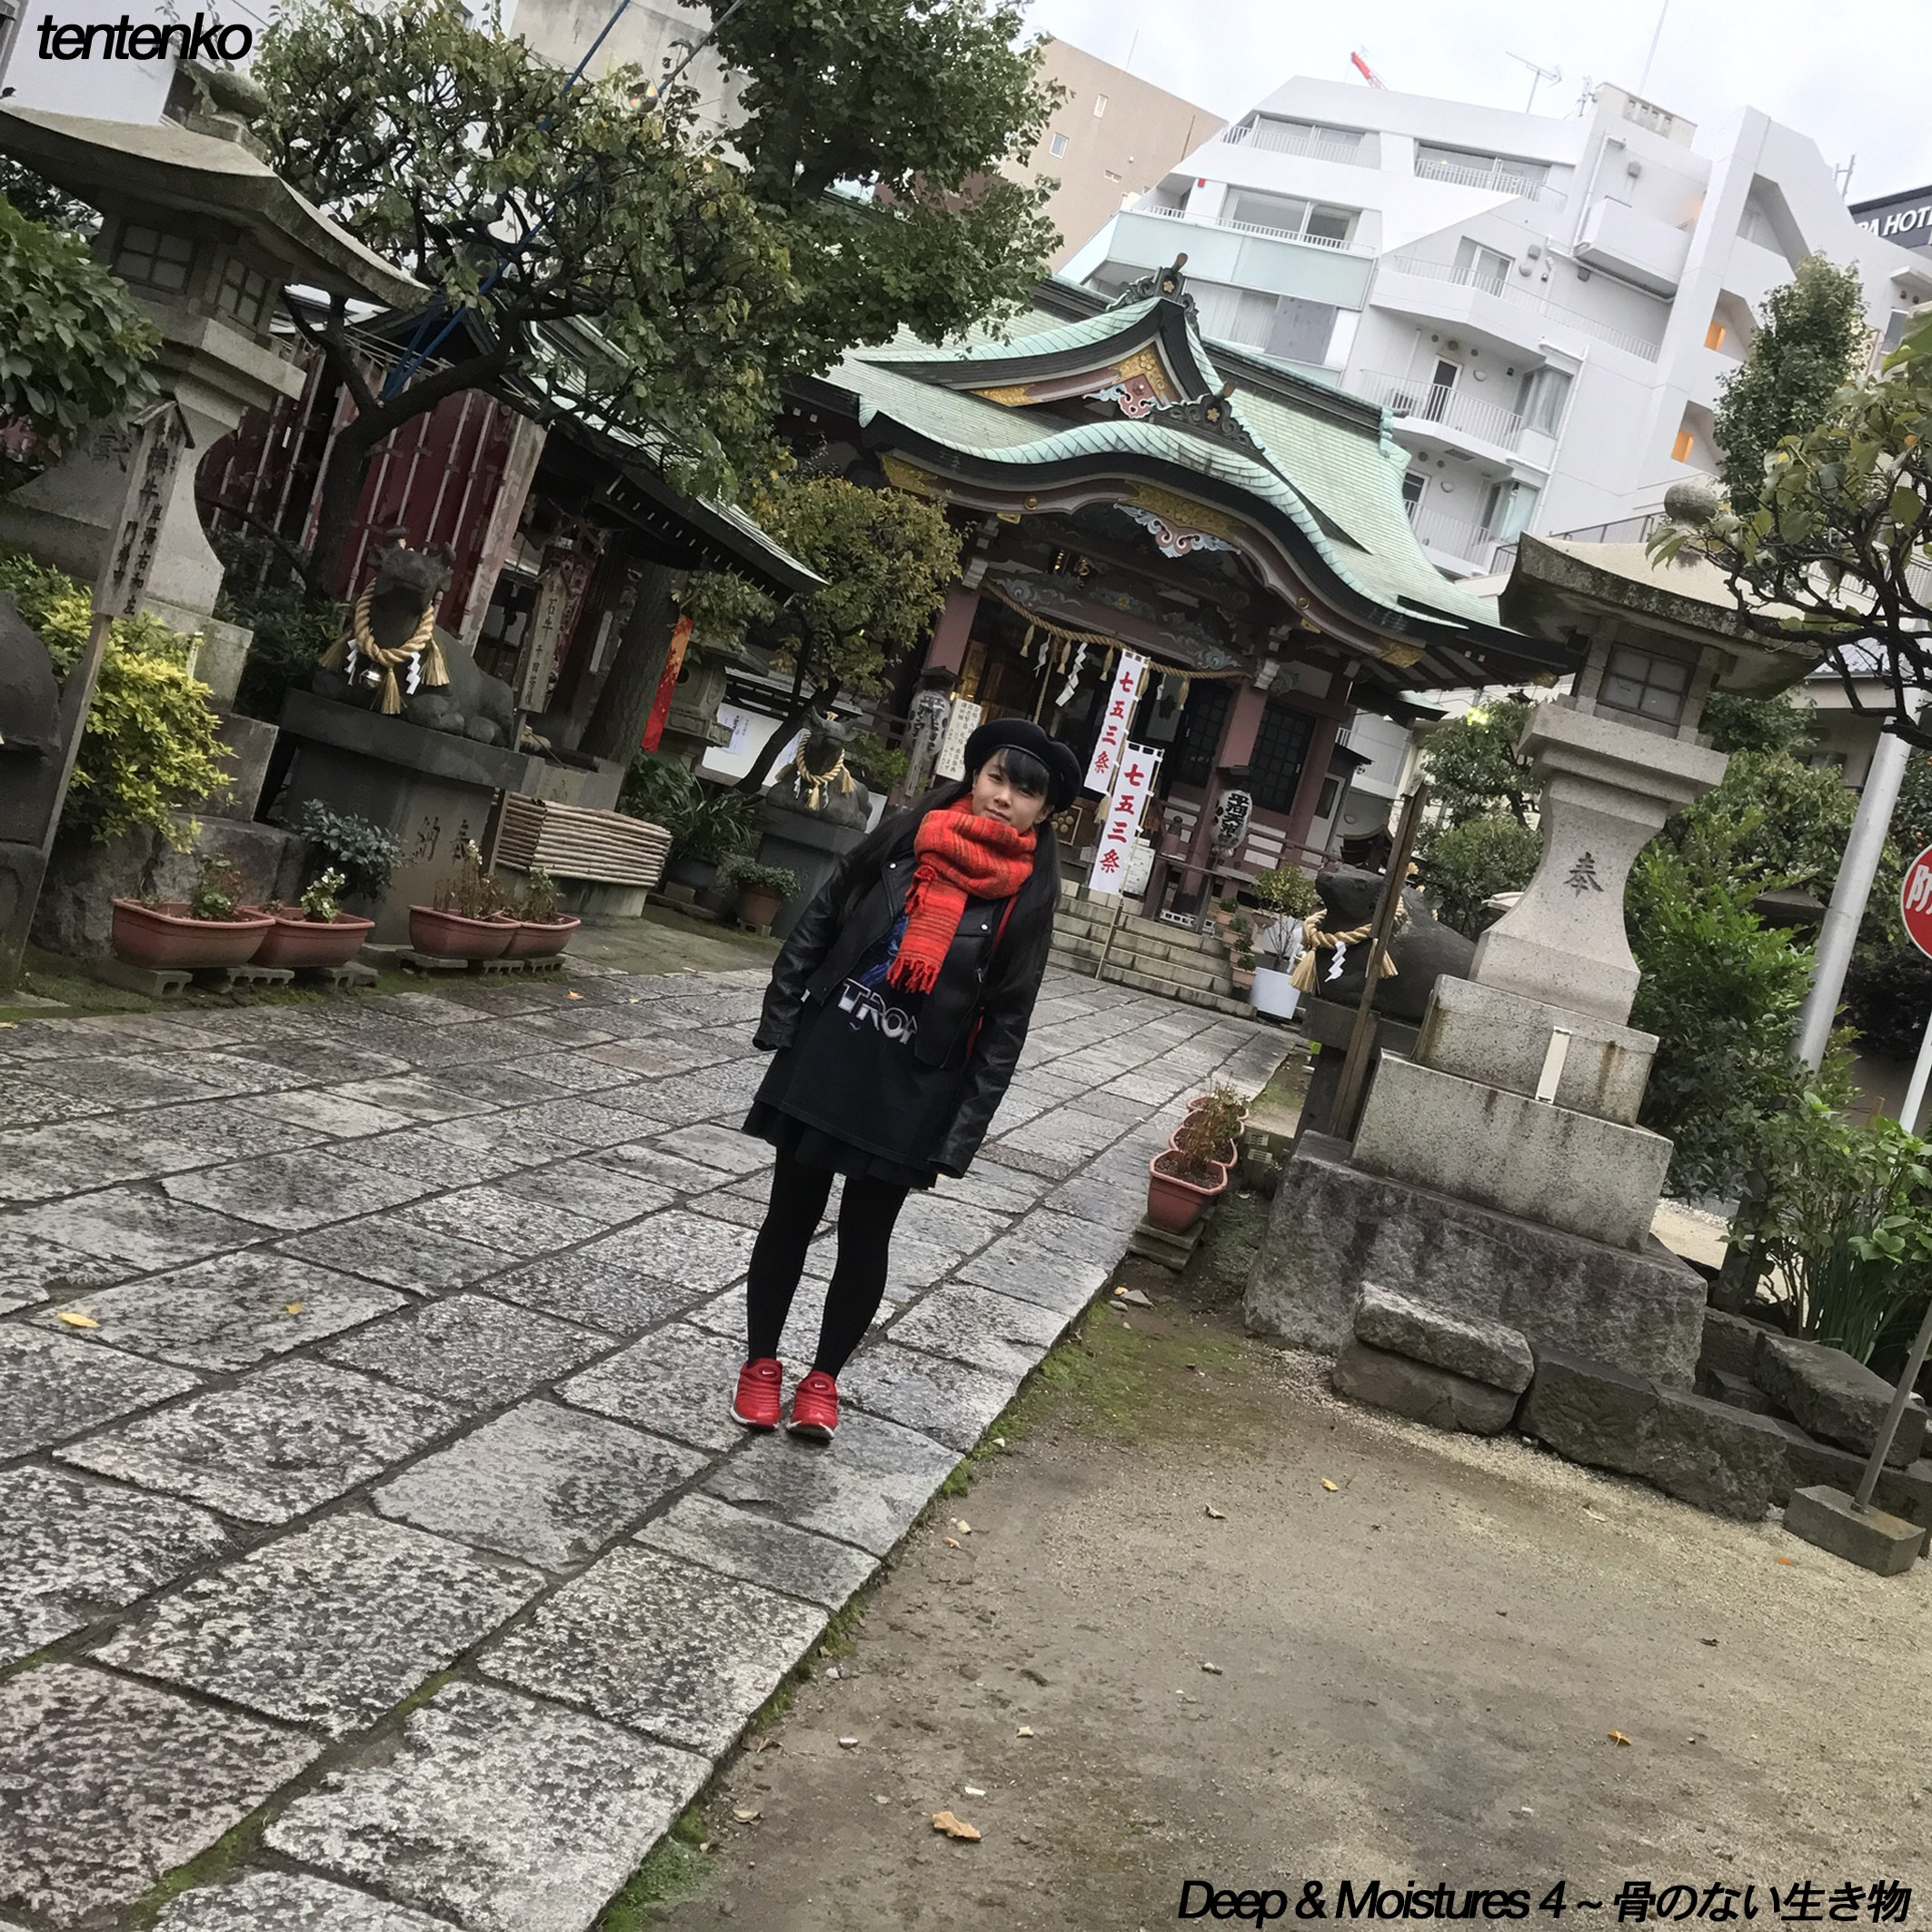 Deep & Moistures 4 ~ Hone no nai Ikimono